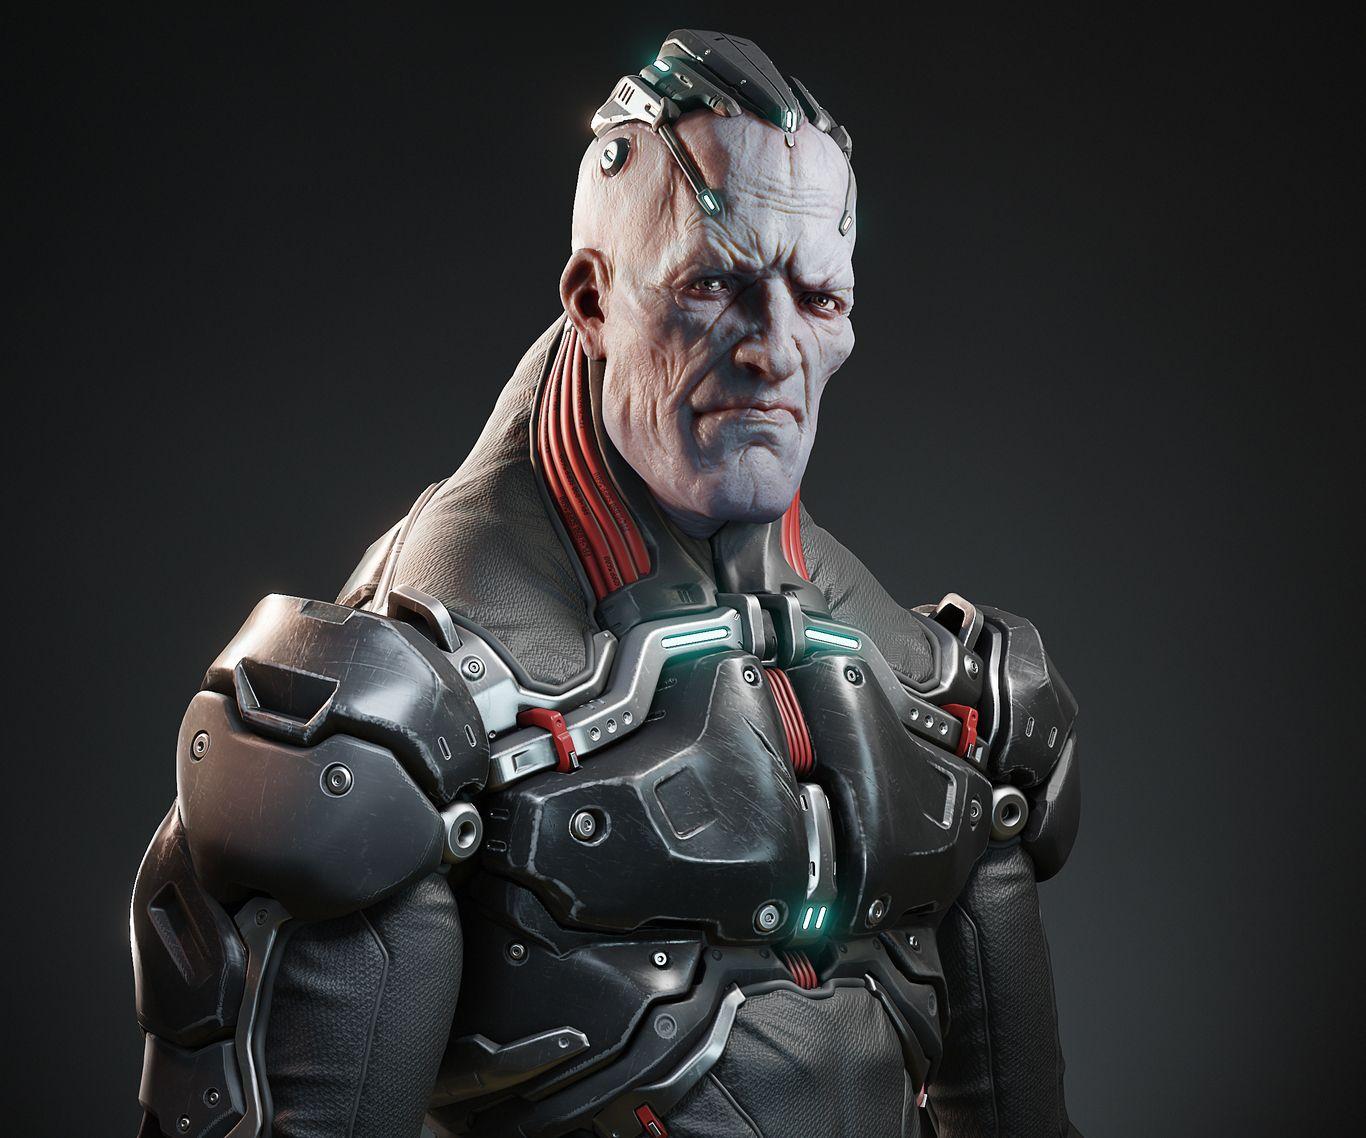 3d model monster robotic alien game character by nik morozov